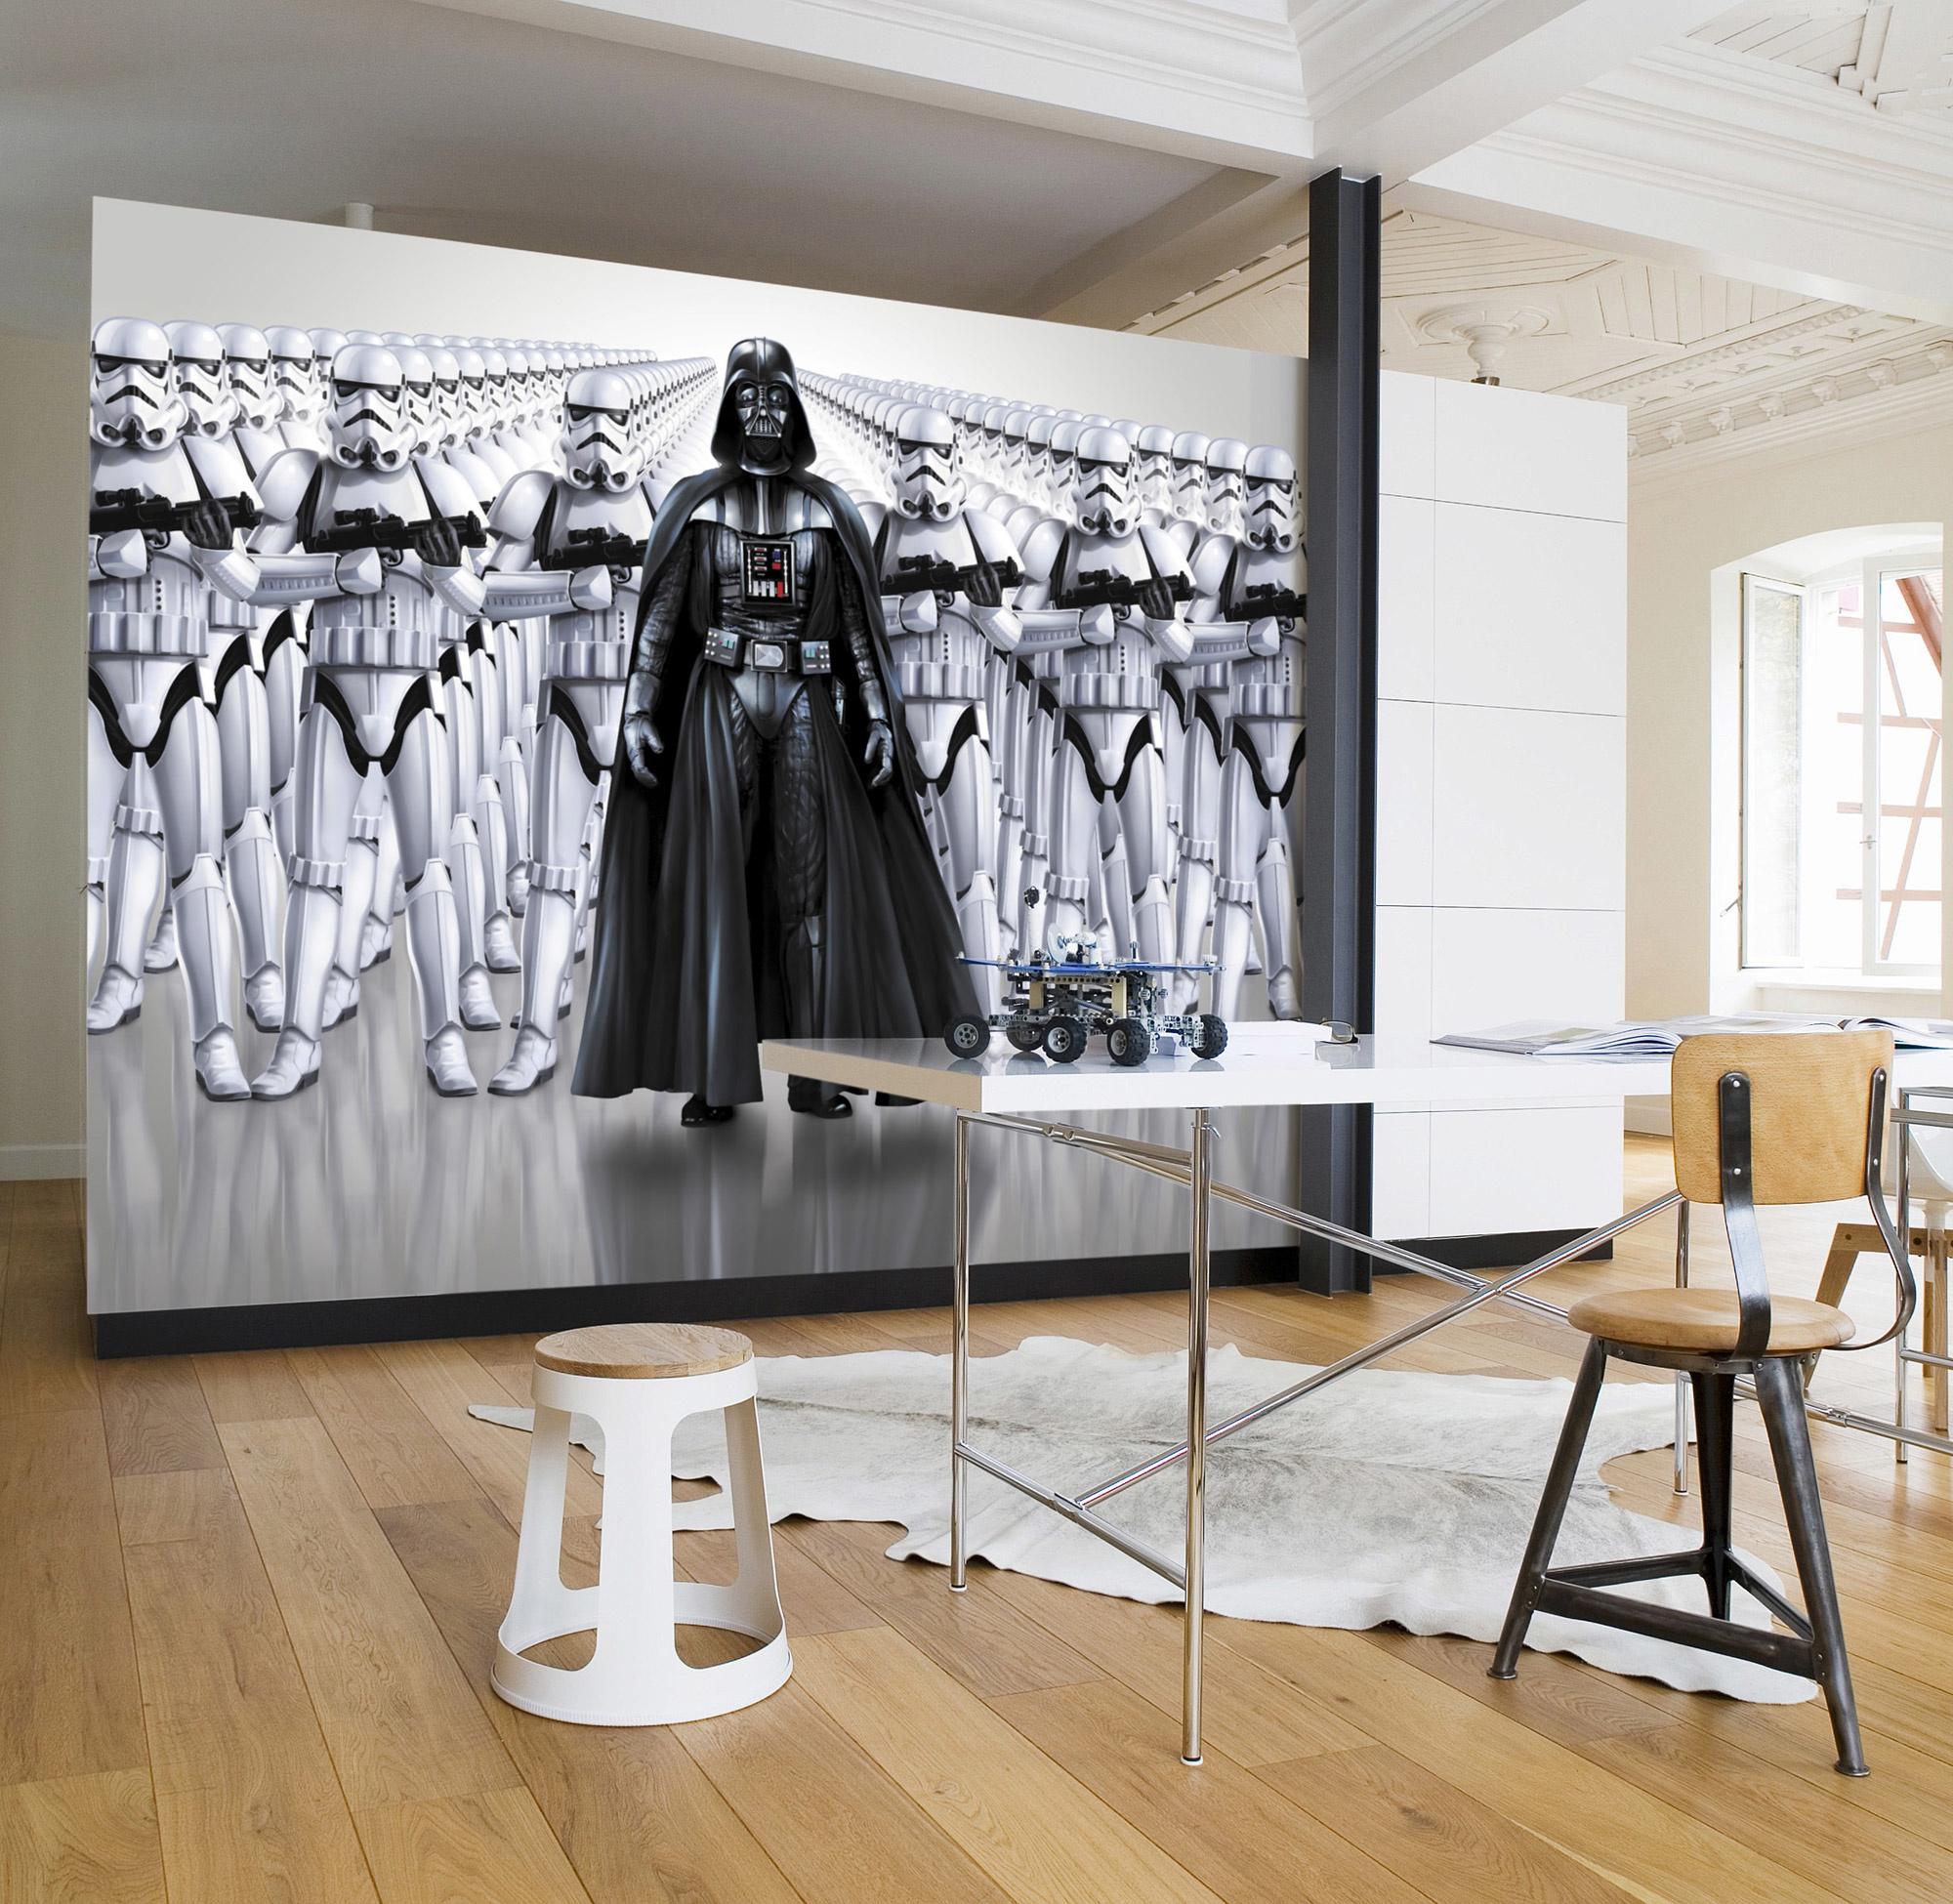 Disney Edition 4 Kinderbehang Komar - Kinderkamer behang  STAR WARS IMPERIAL FORCE